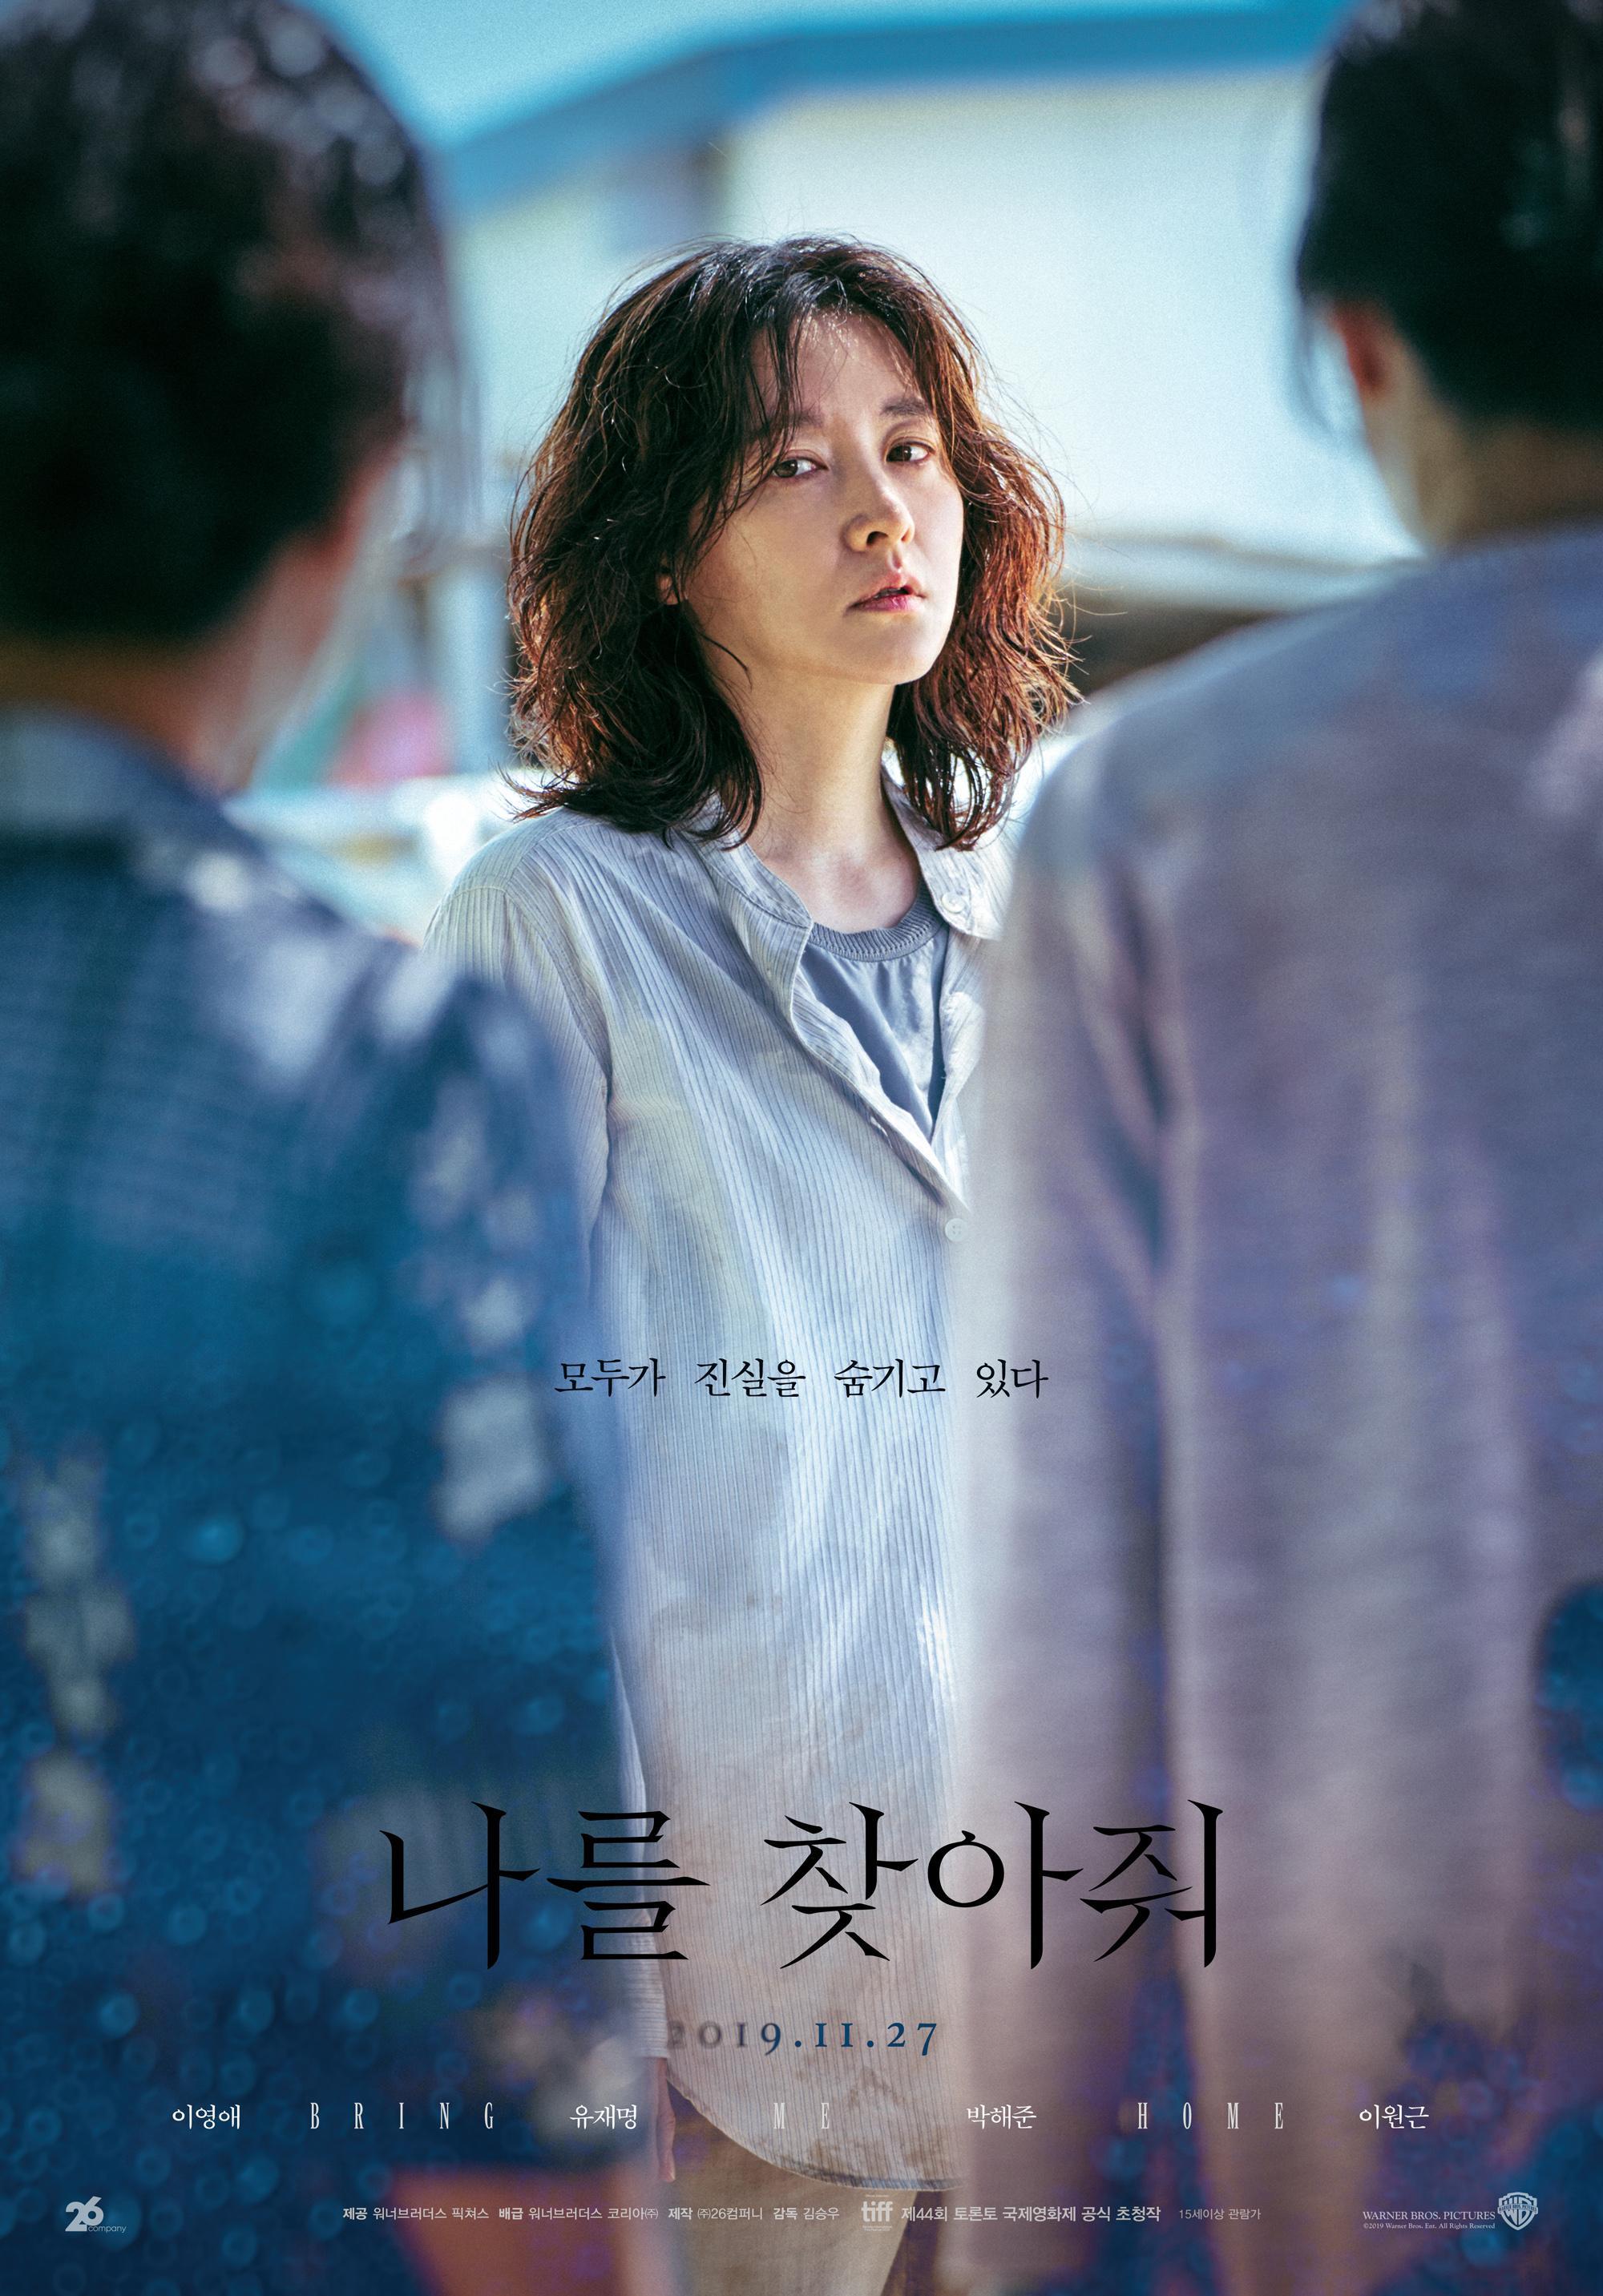 <b>[화제작] 이영애 주연.6년 전 실종된 아이 (( ㅡ 나 를 찾 아 줘 ㅡ )) 고..</b>